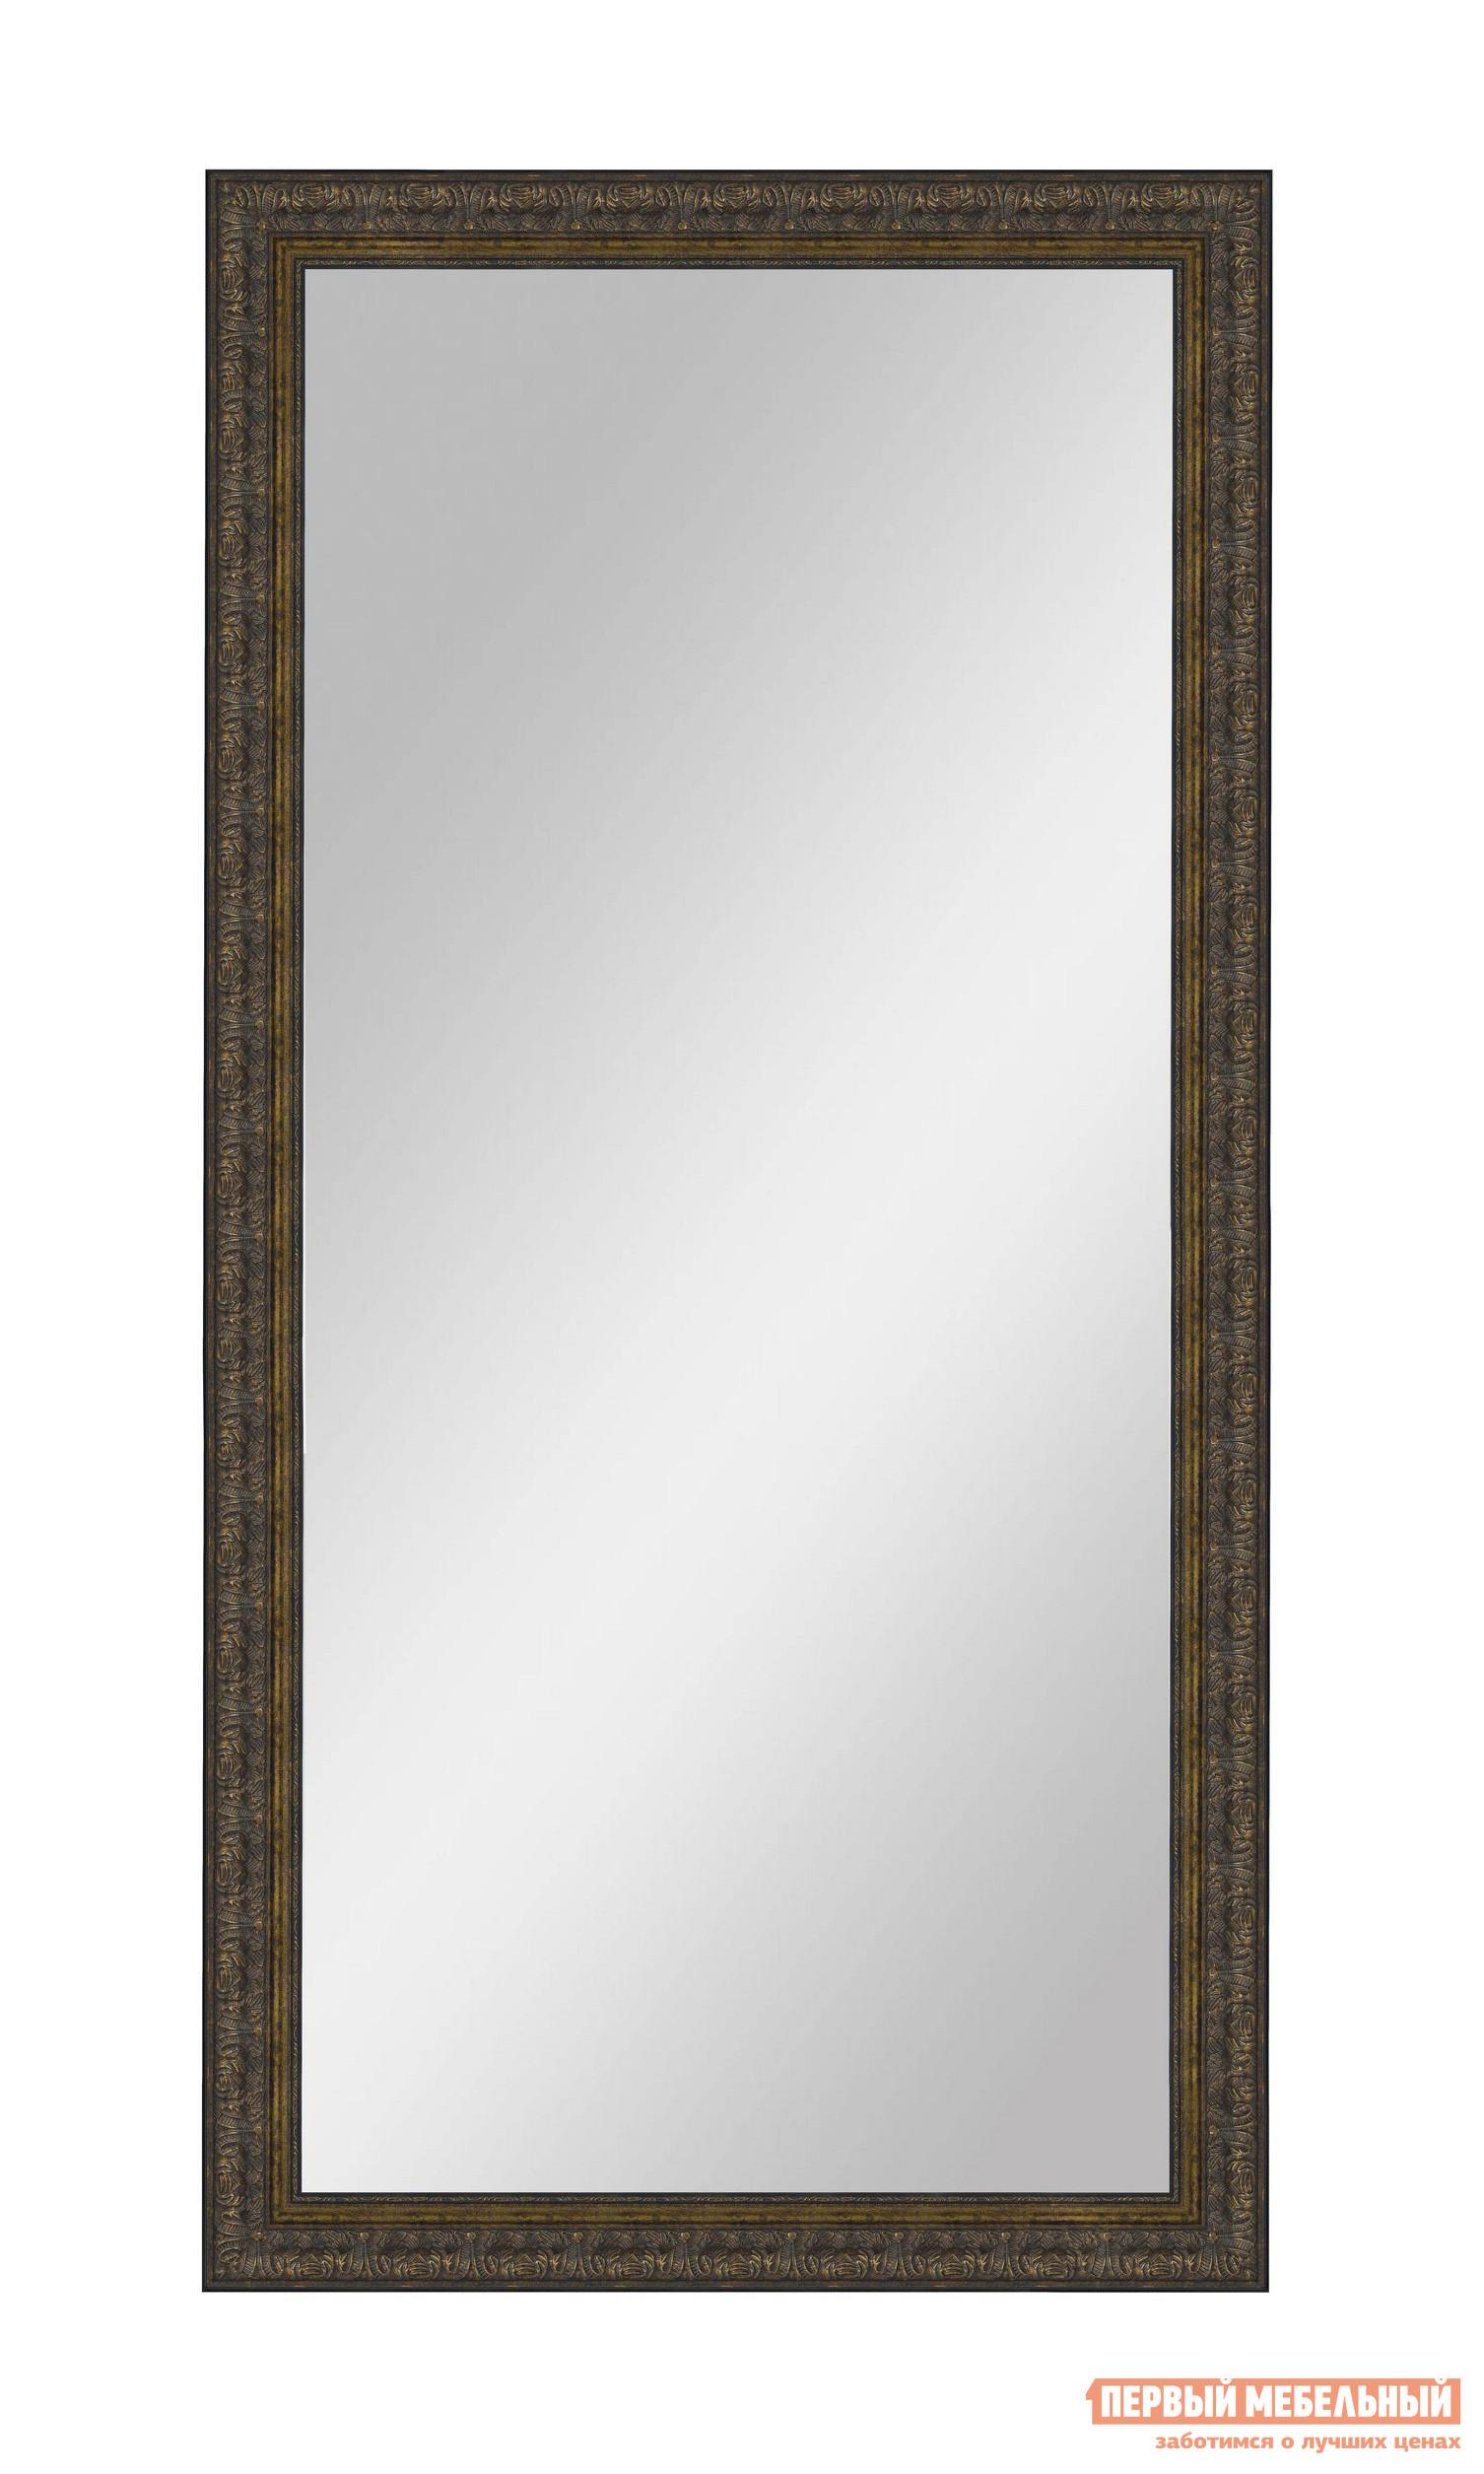 "Напольное зеркало ZerkaloStudio ""Бронзовая Луара"" (676.M68.180n) 90 Х 190 см, Бронзовый"